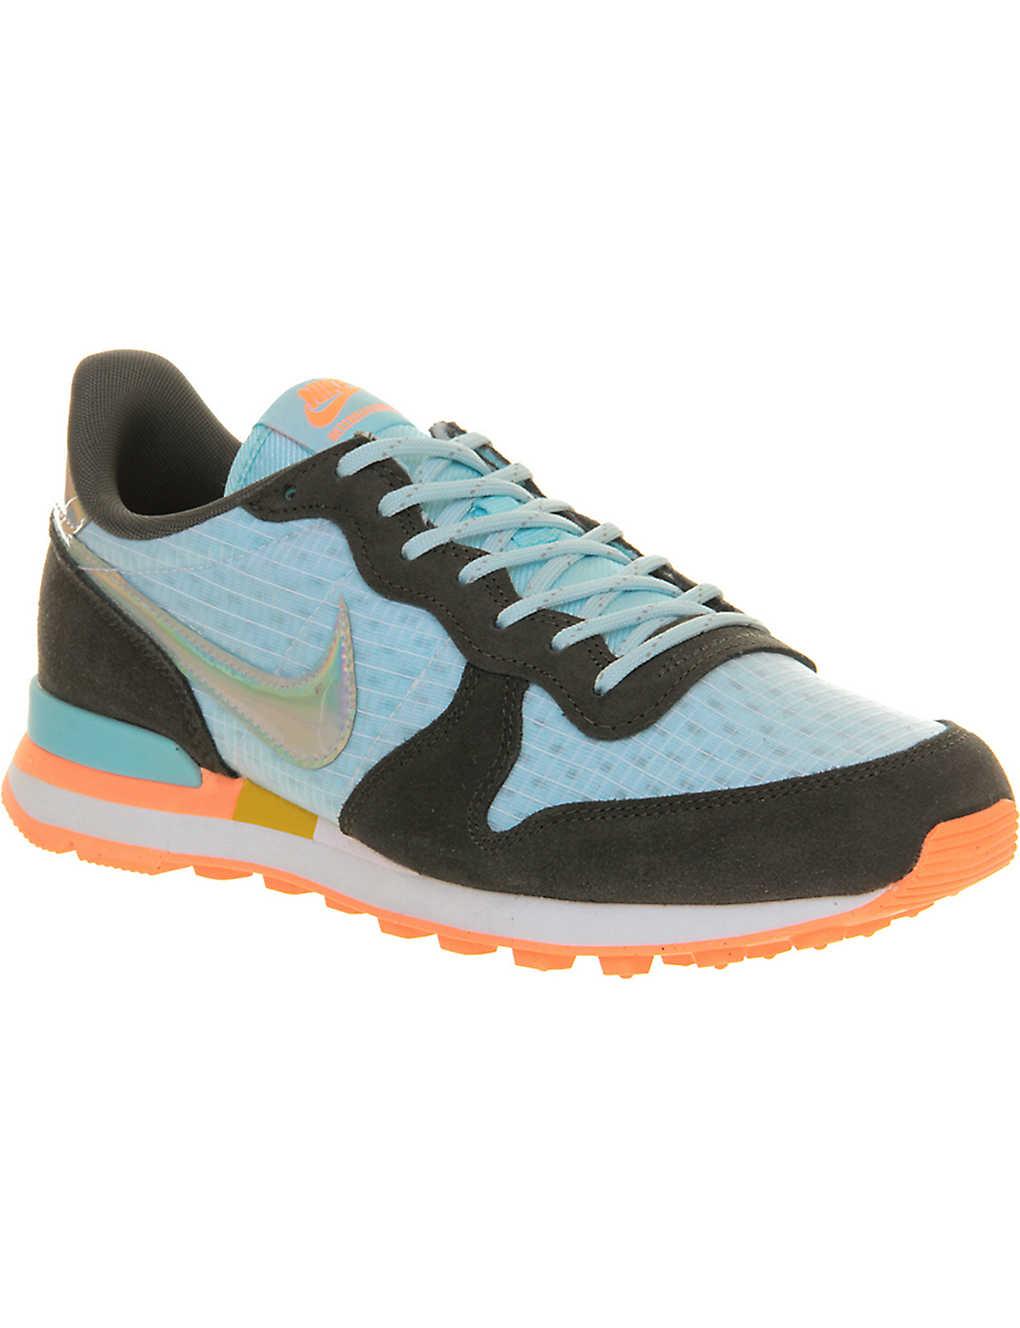 cheap for discount 74503 06eb9 NIKE - Internationalist trainers | Selfridges.com